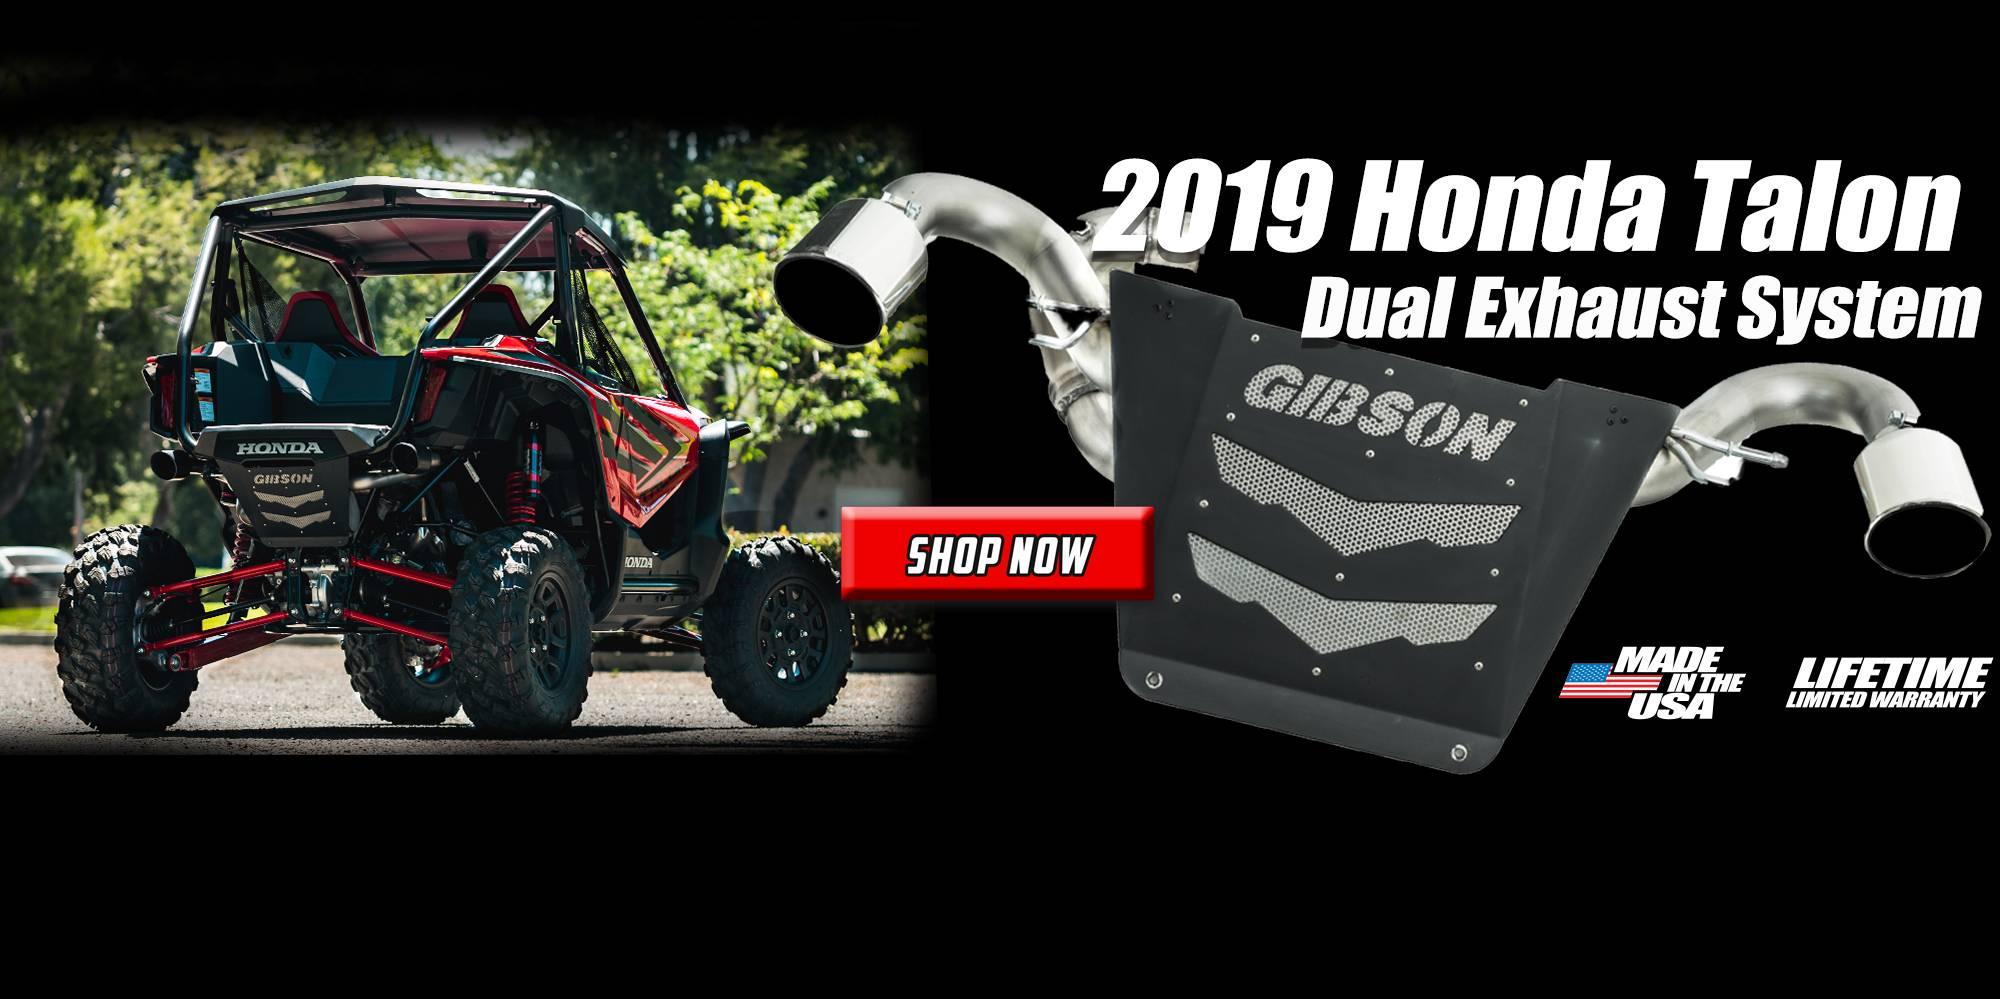 2019 Honda Talon